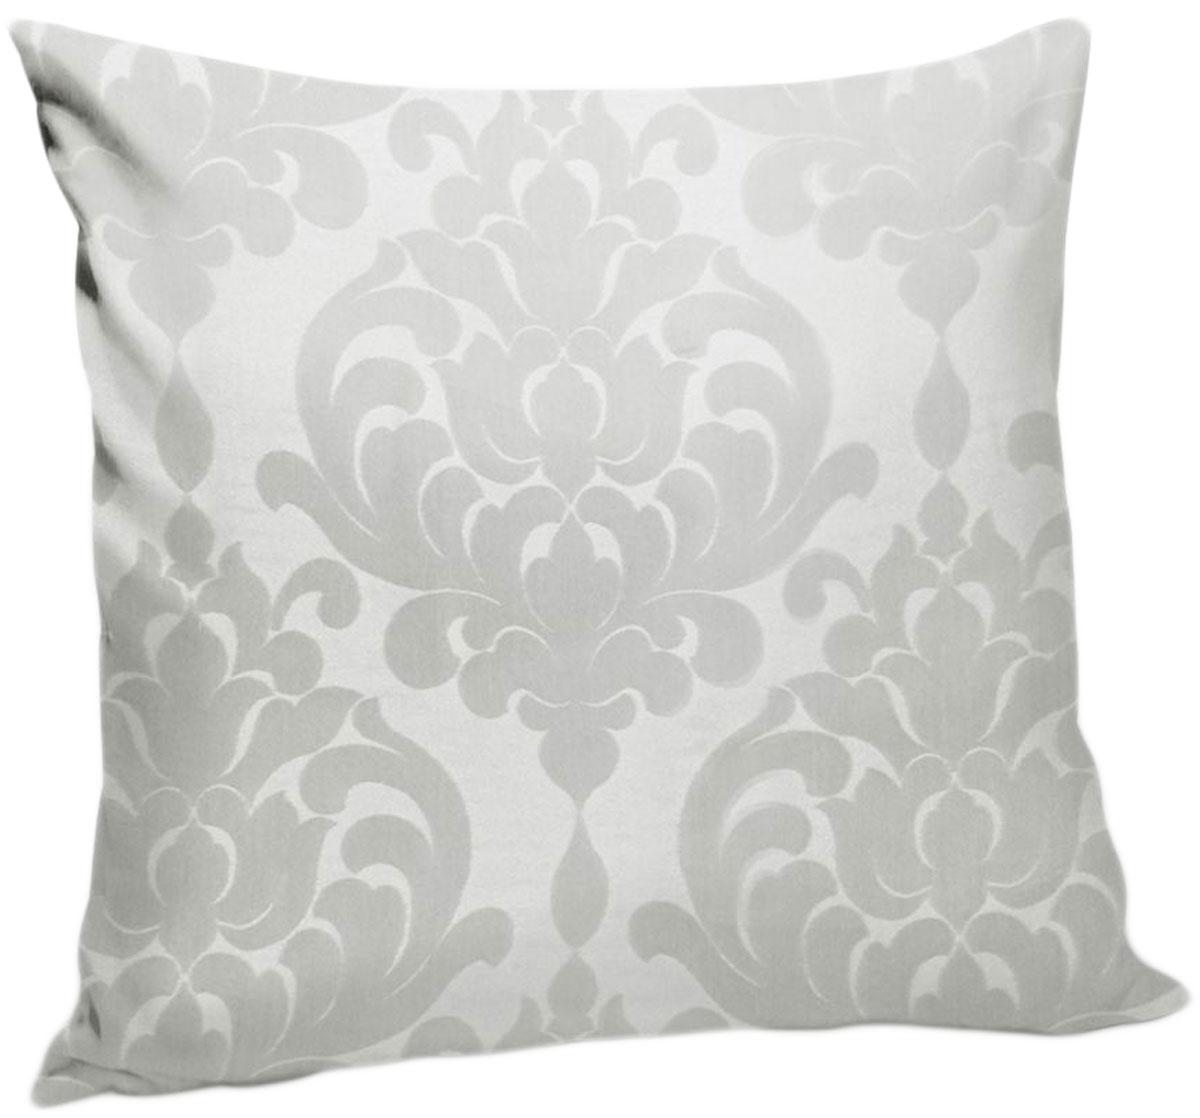 Подушка декоративная KauffOrt Бордо, цвет: бежевый, 40 x 40 см подушка декоративная kauffort мауритани цвет бежевый 40 x 40 см